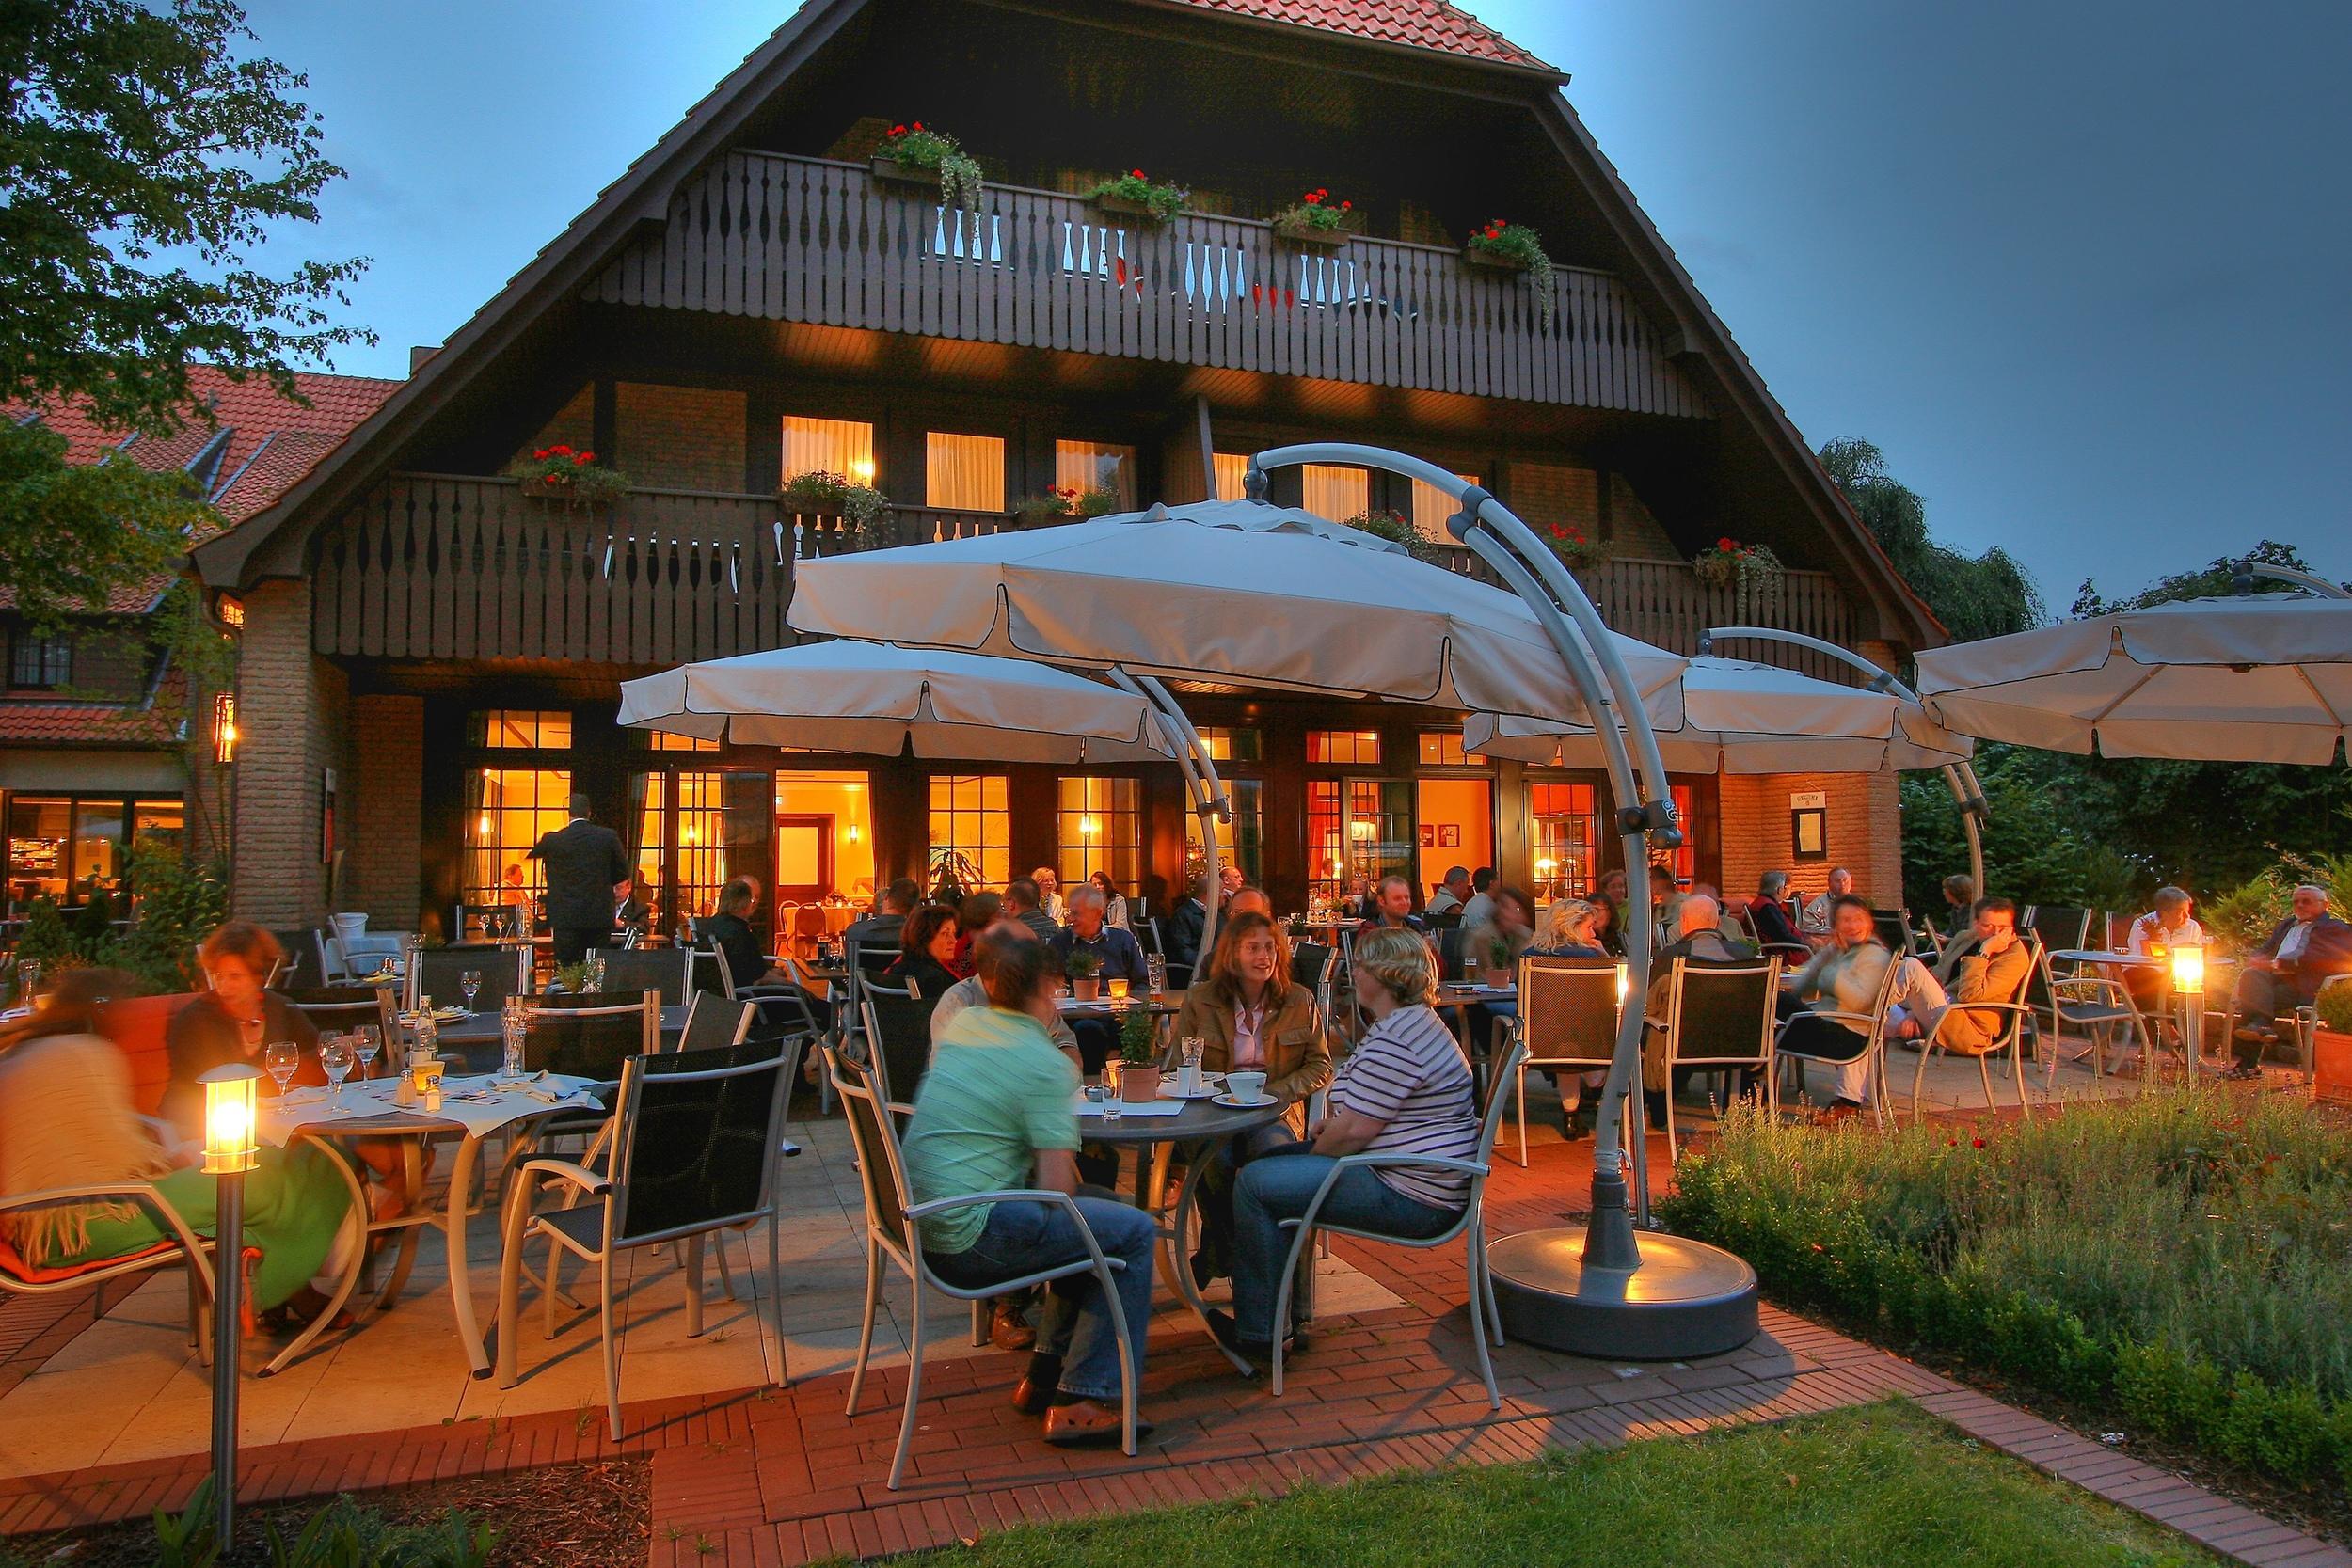 Hotel Bramsche Idingshof Abendszene_Terasse2.jpg